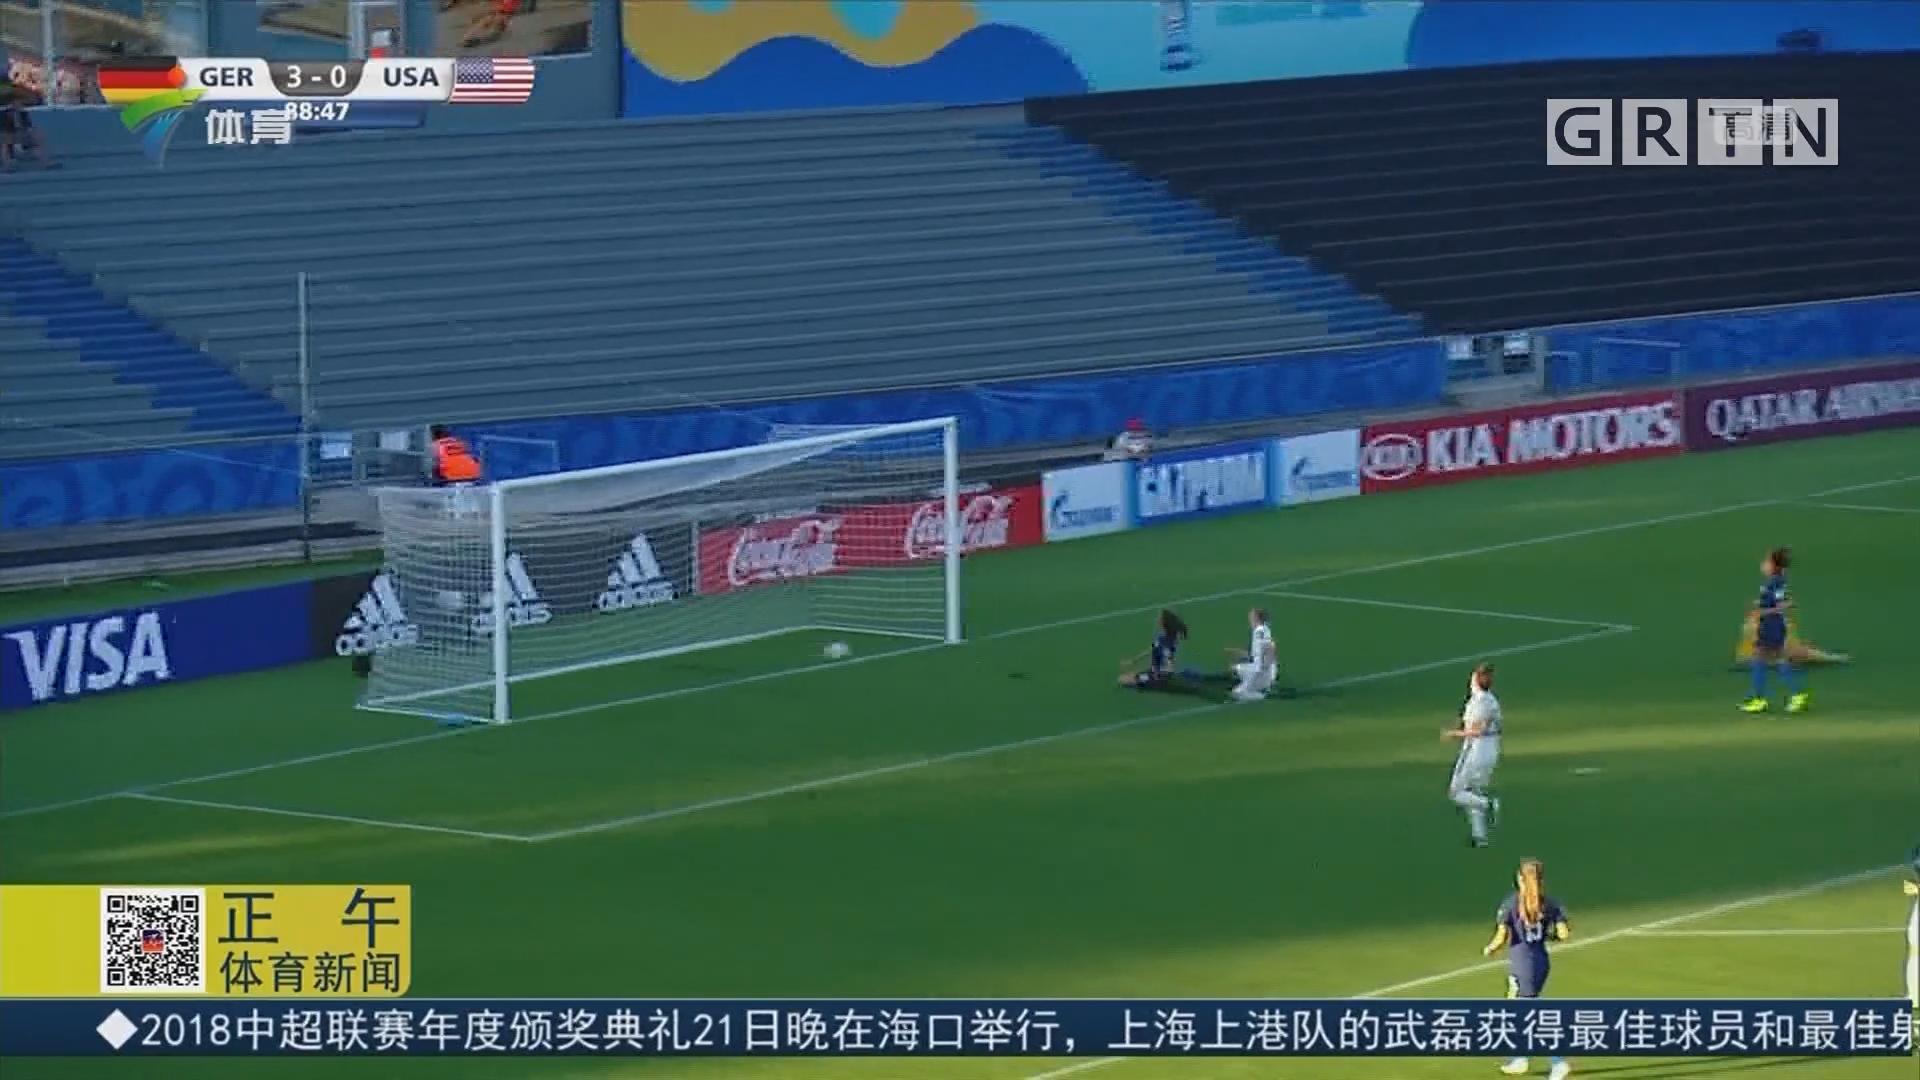 U17女足世界杯 德国四球大胜美国